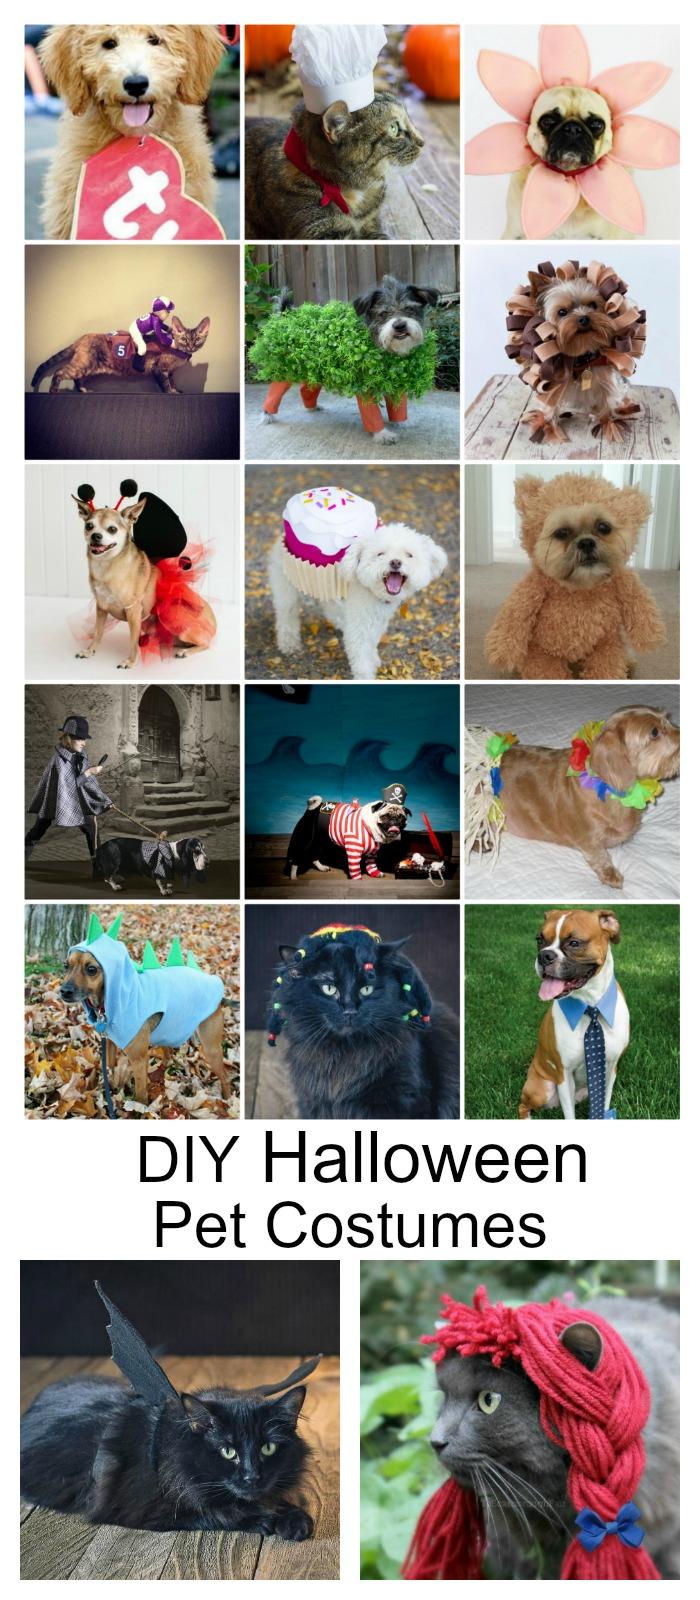 diy-halloween-pet-costumes-pin